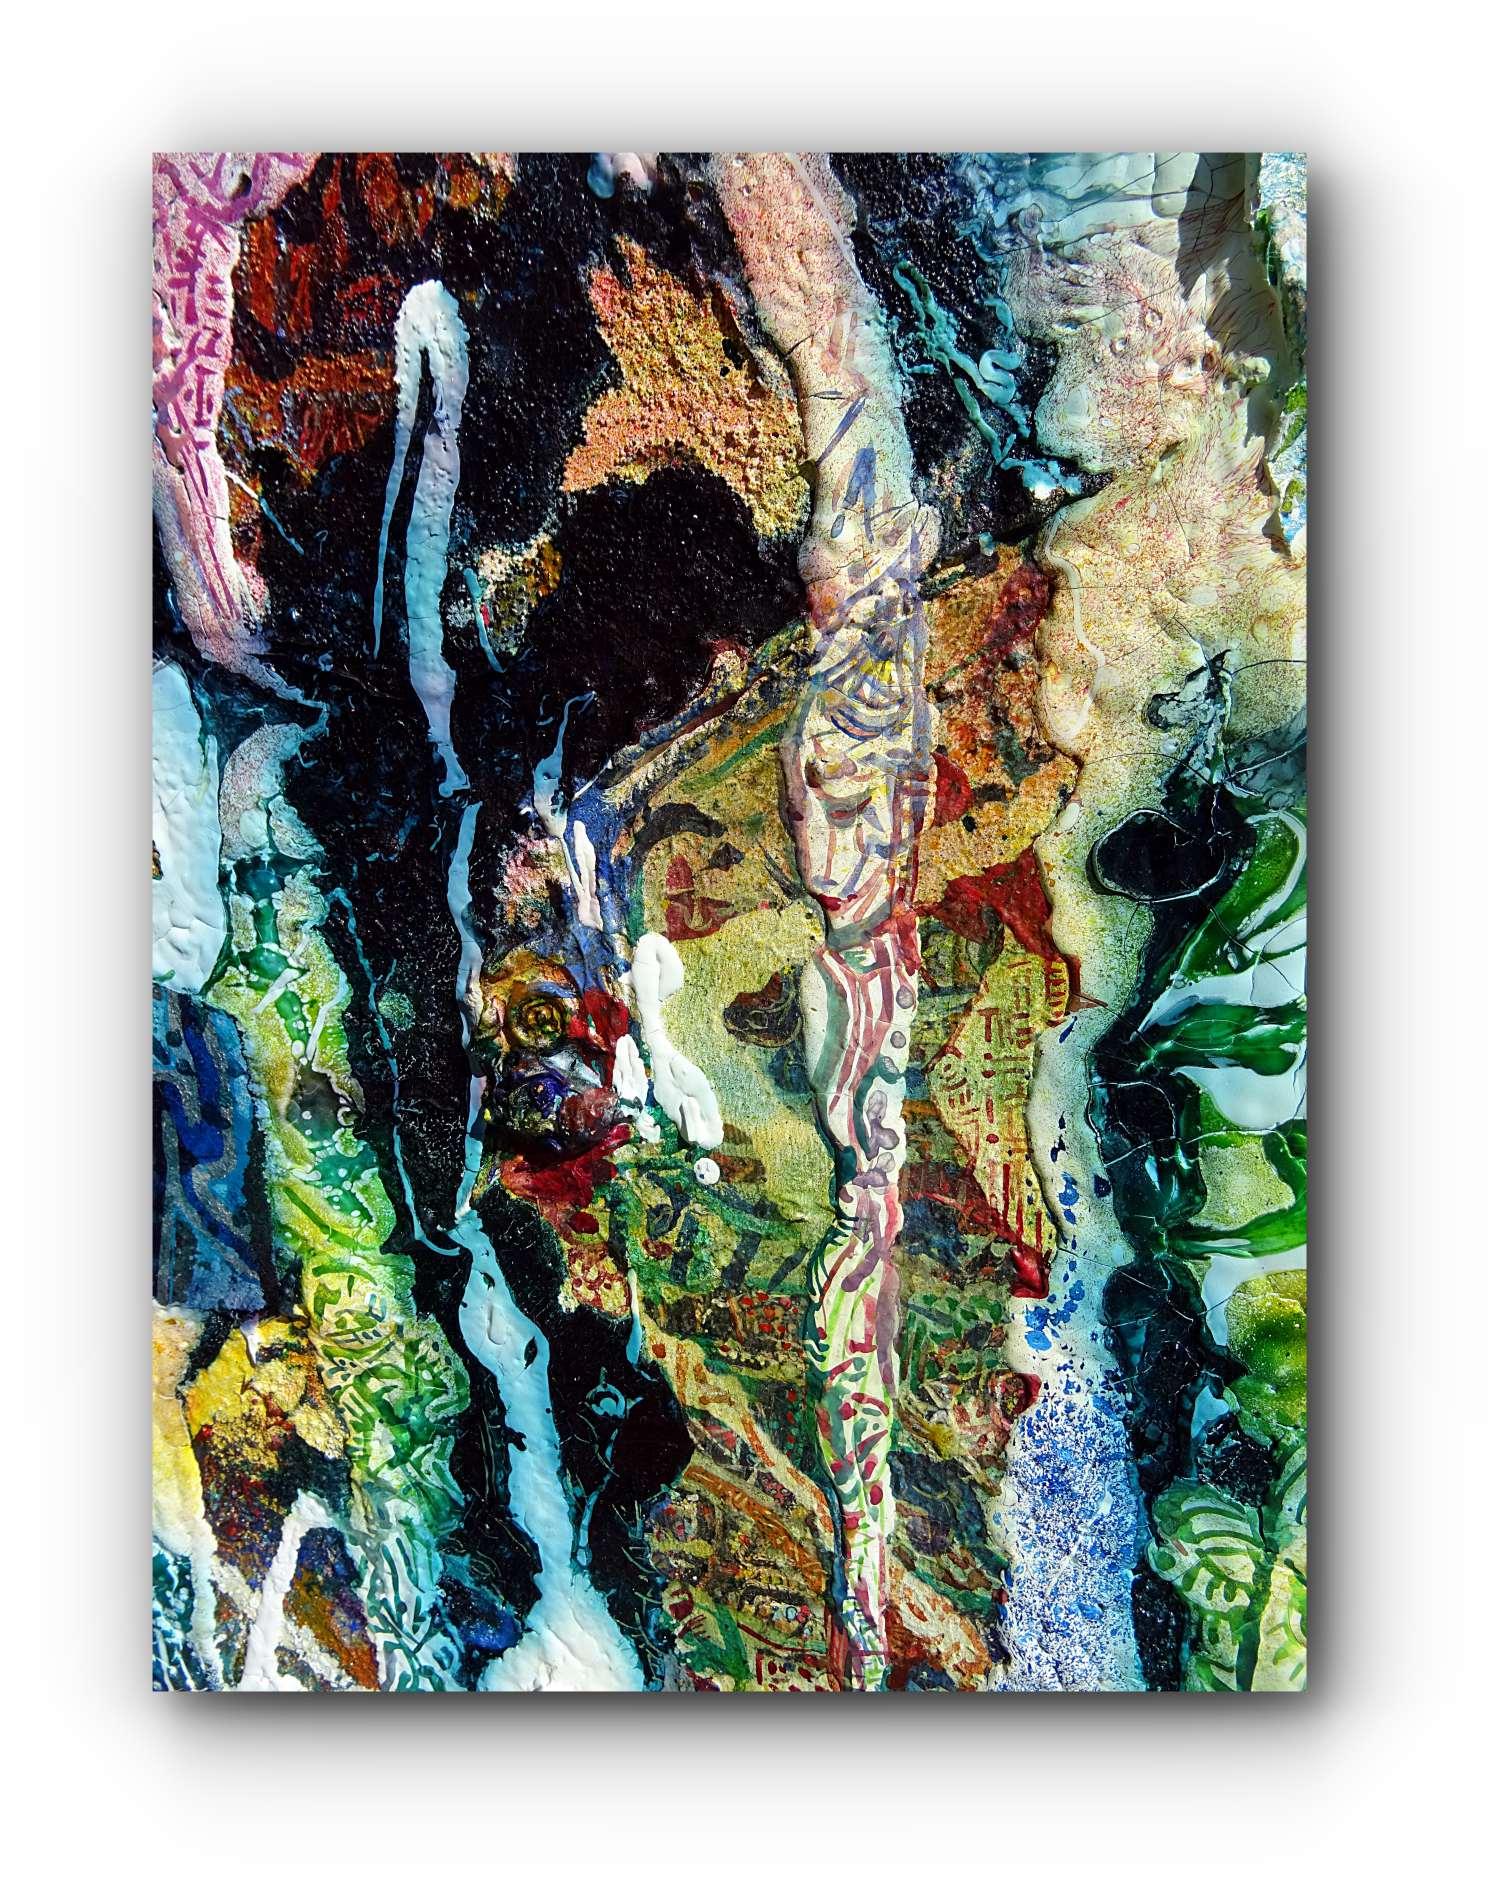 painting-detail-2-kiss-artist-duo-ingress-vortices.jpg